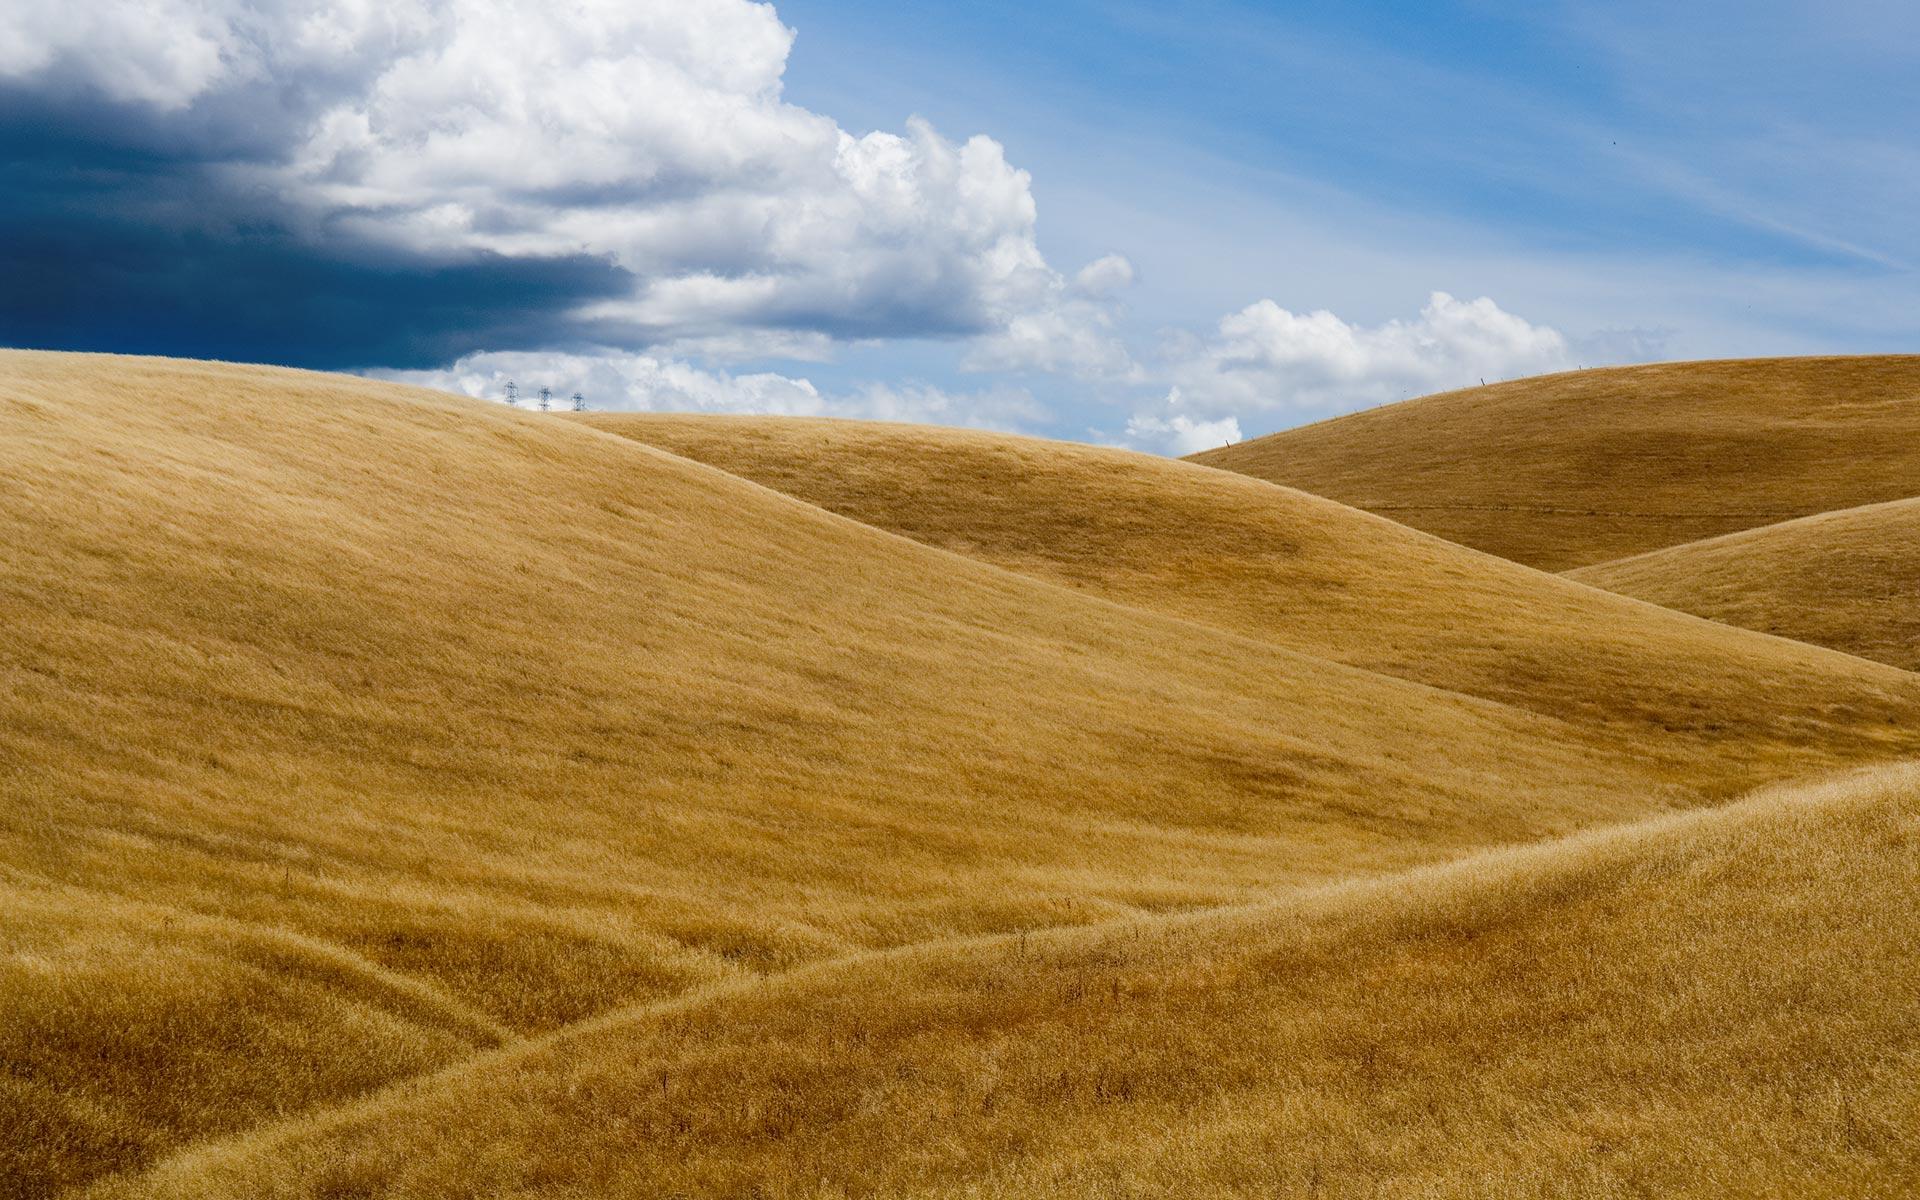 Amber Waves Of Grain Wallpaper Myconfinedspace